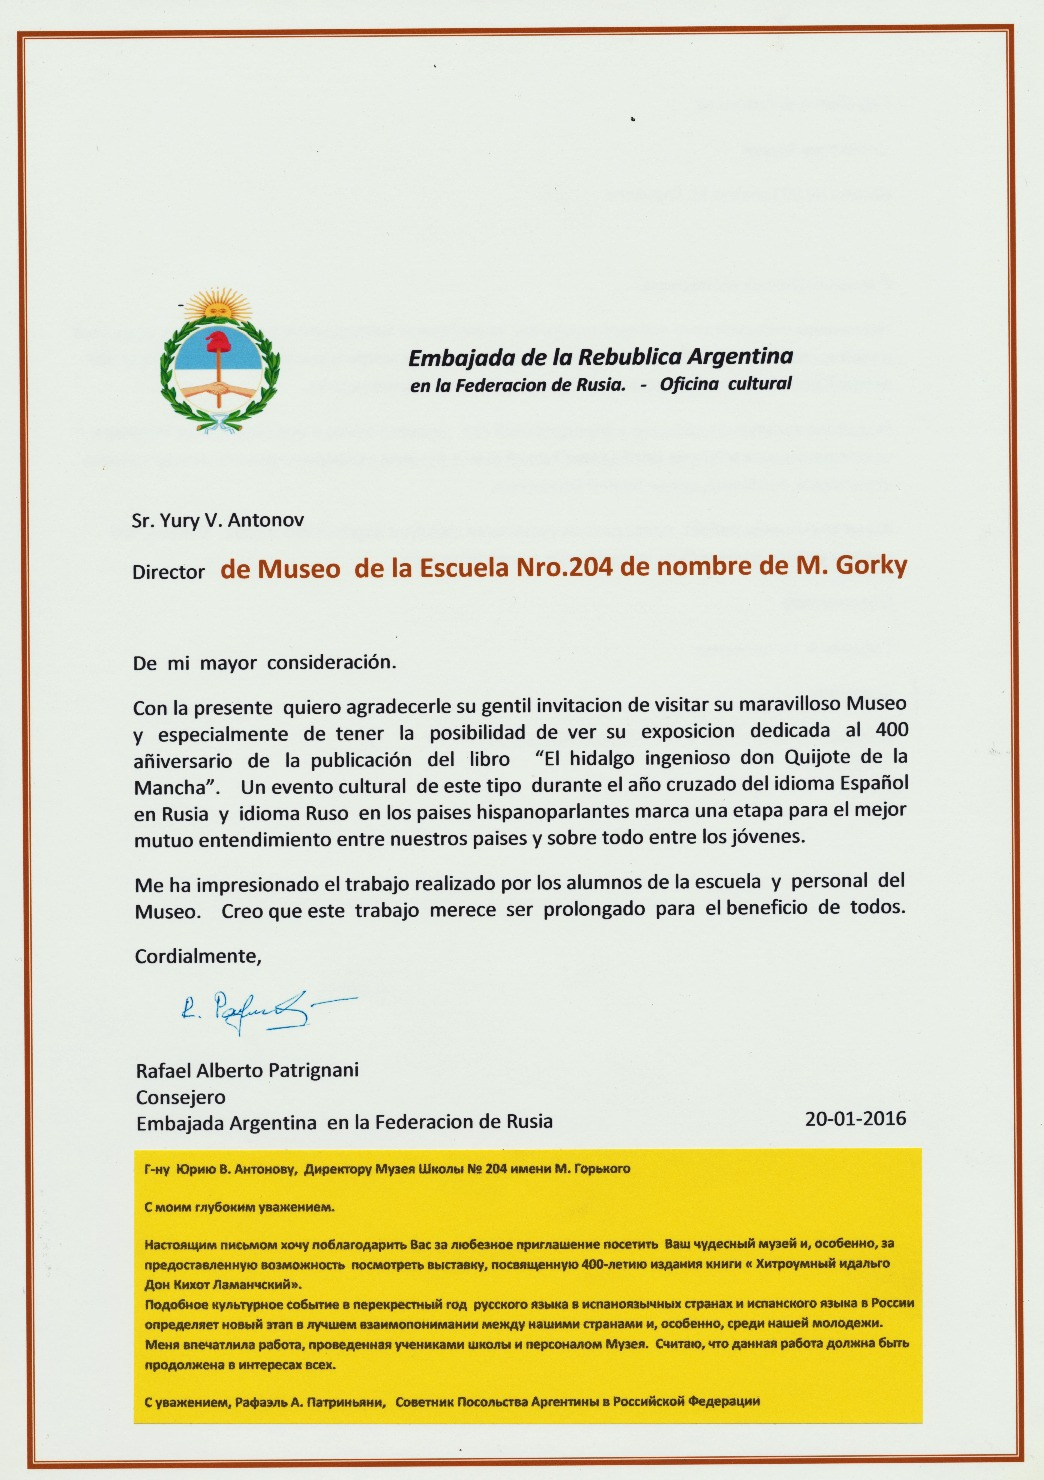 018 посольство Аргентины_edited